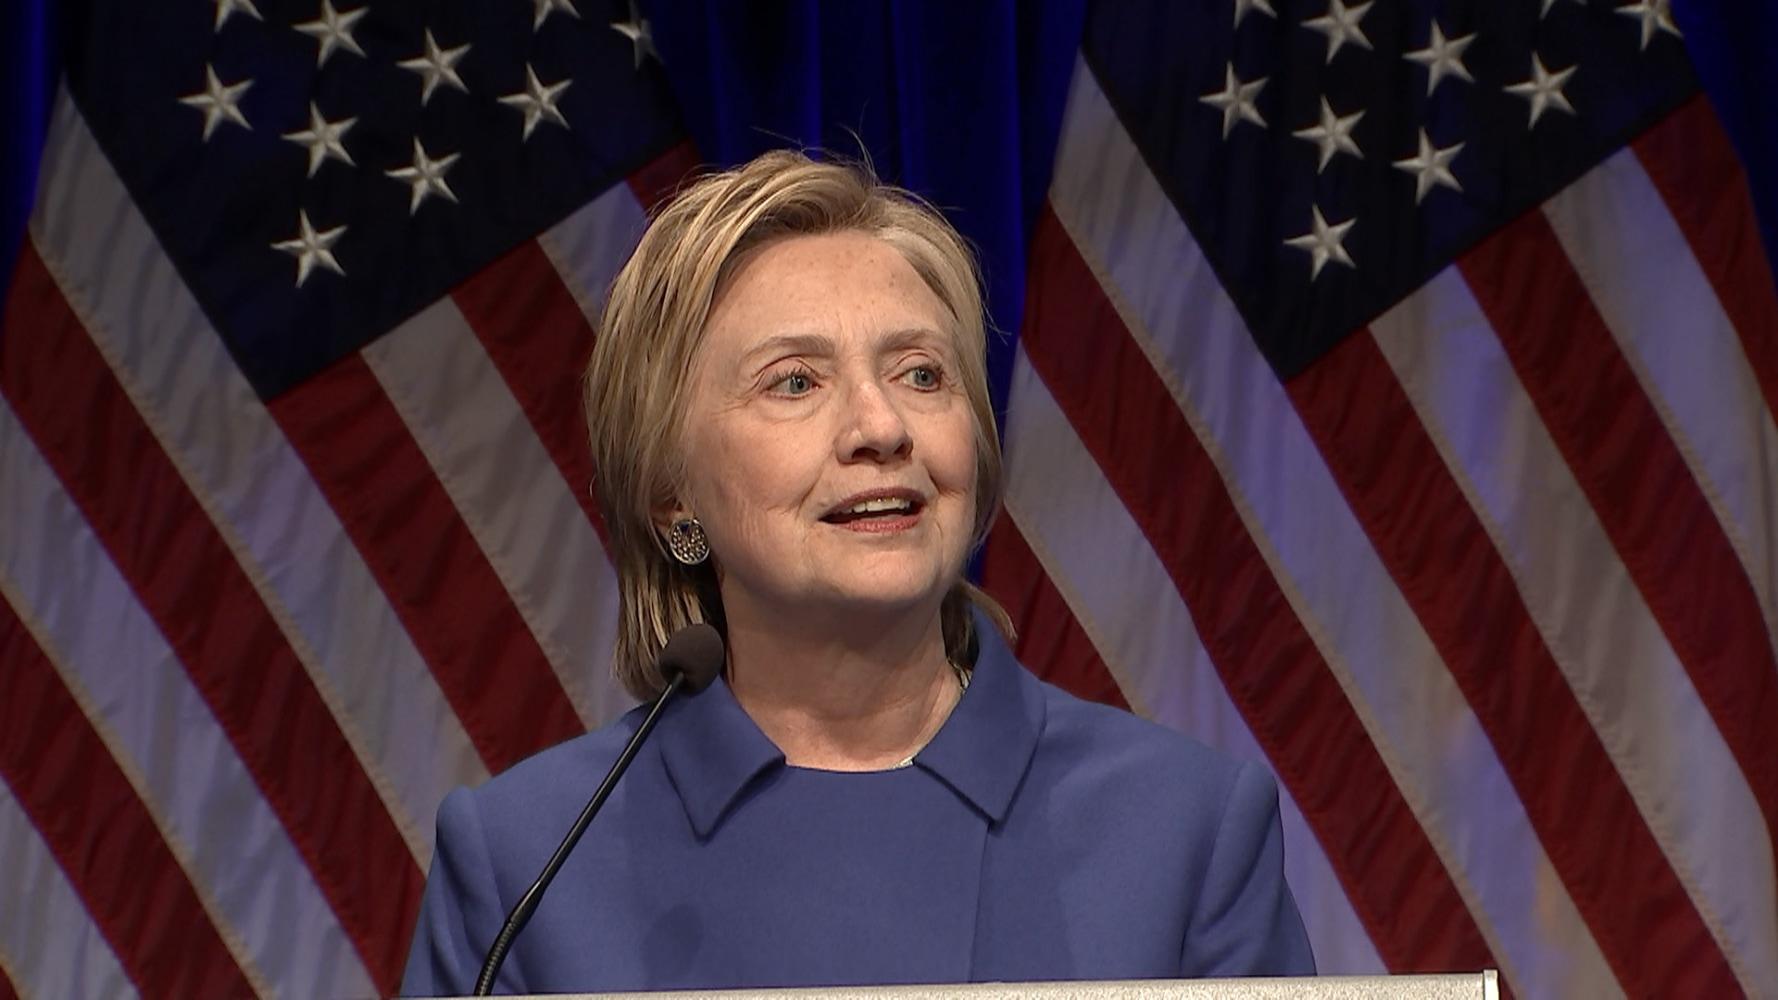 Bid to end Electoral College after Trump win